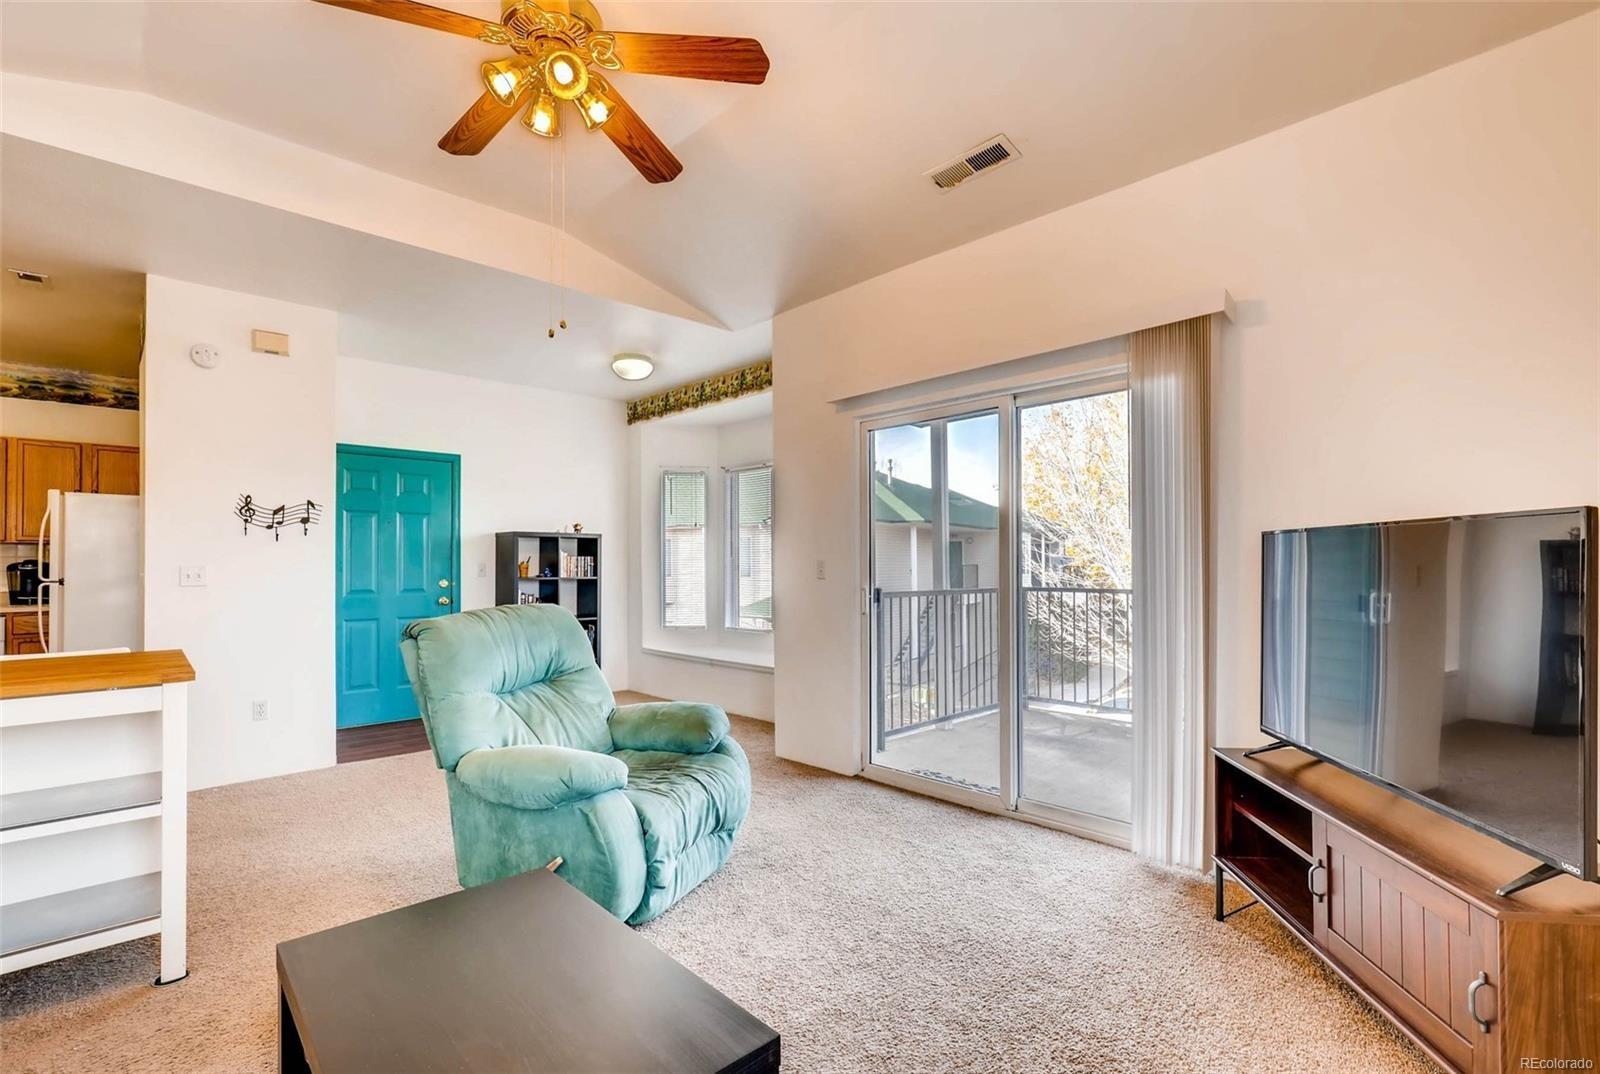 MLS# 9808696 - 13 - 2049 Legacy Ridge View, Colorado Springs, CO 80910